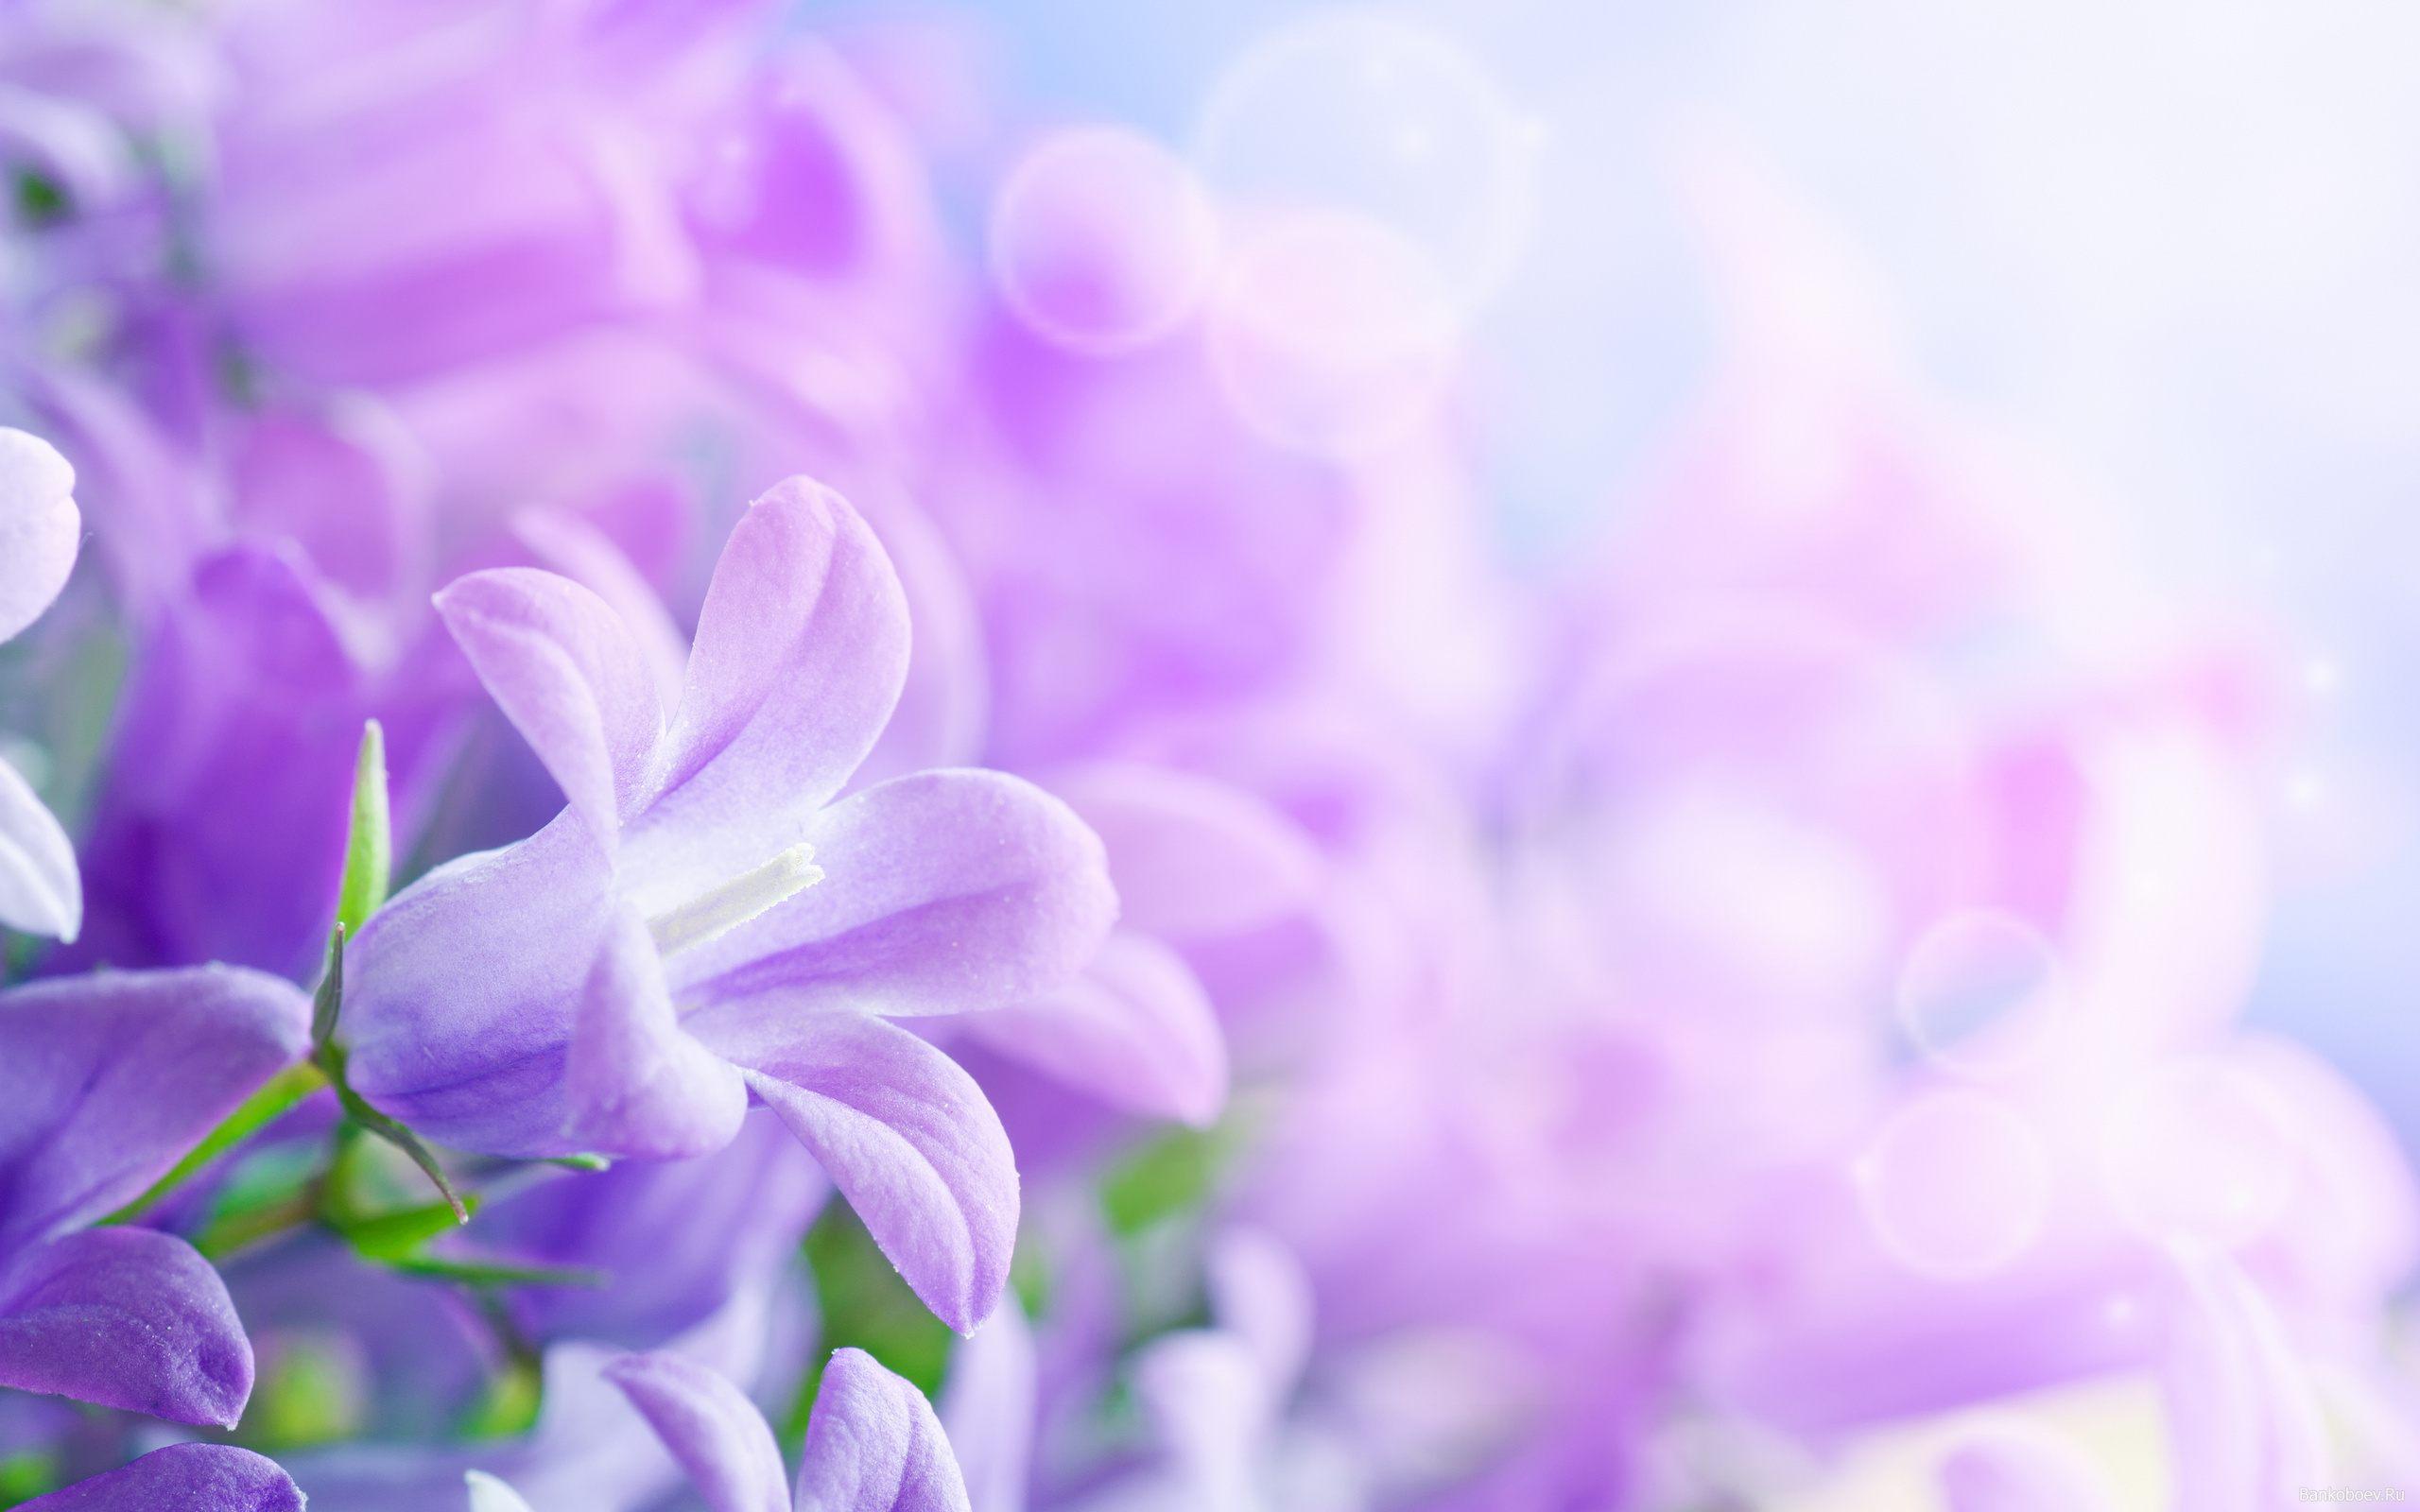 Purple Flowers Background Wallpaper Download For Desktop 2560x1600